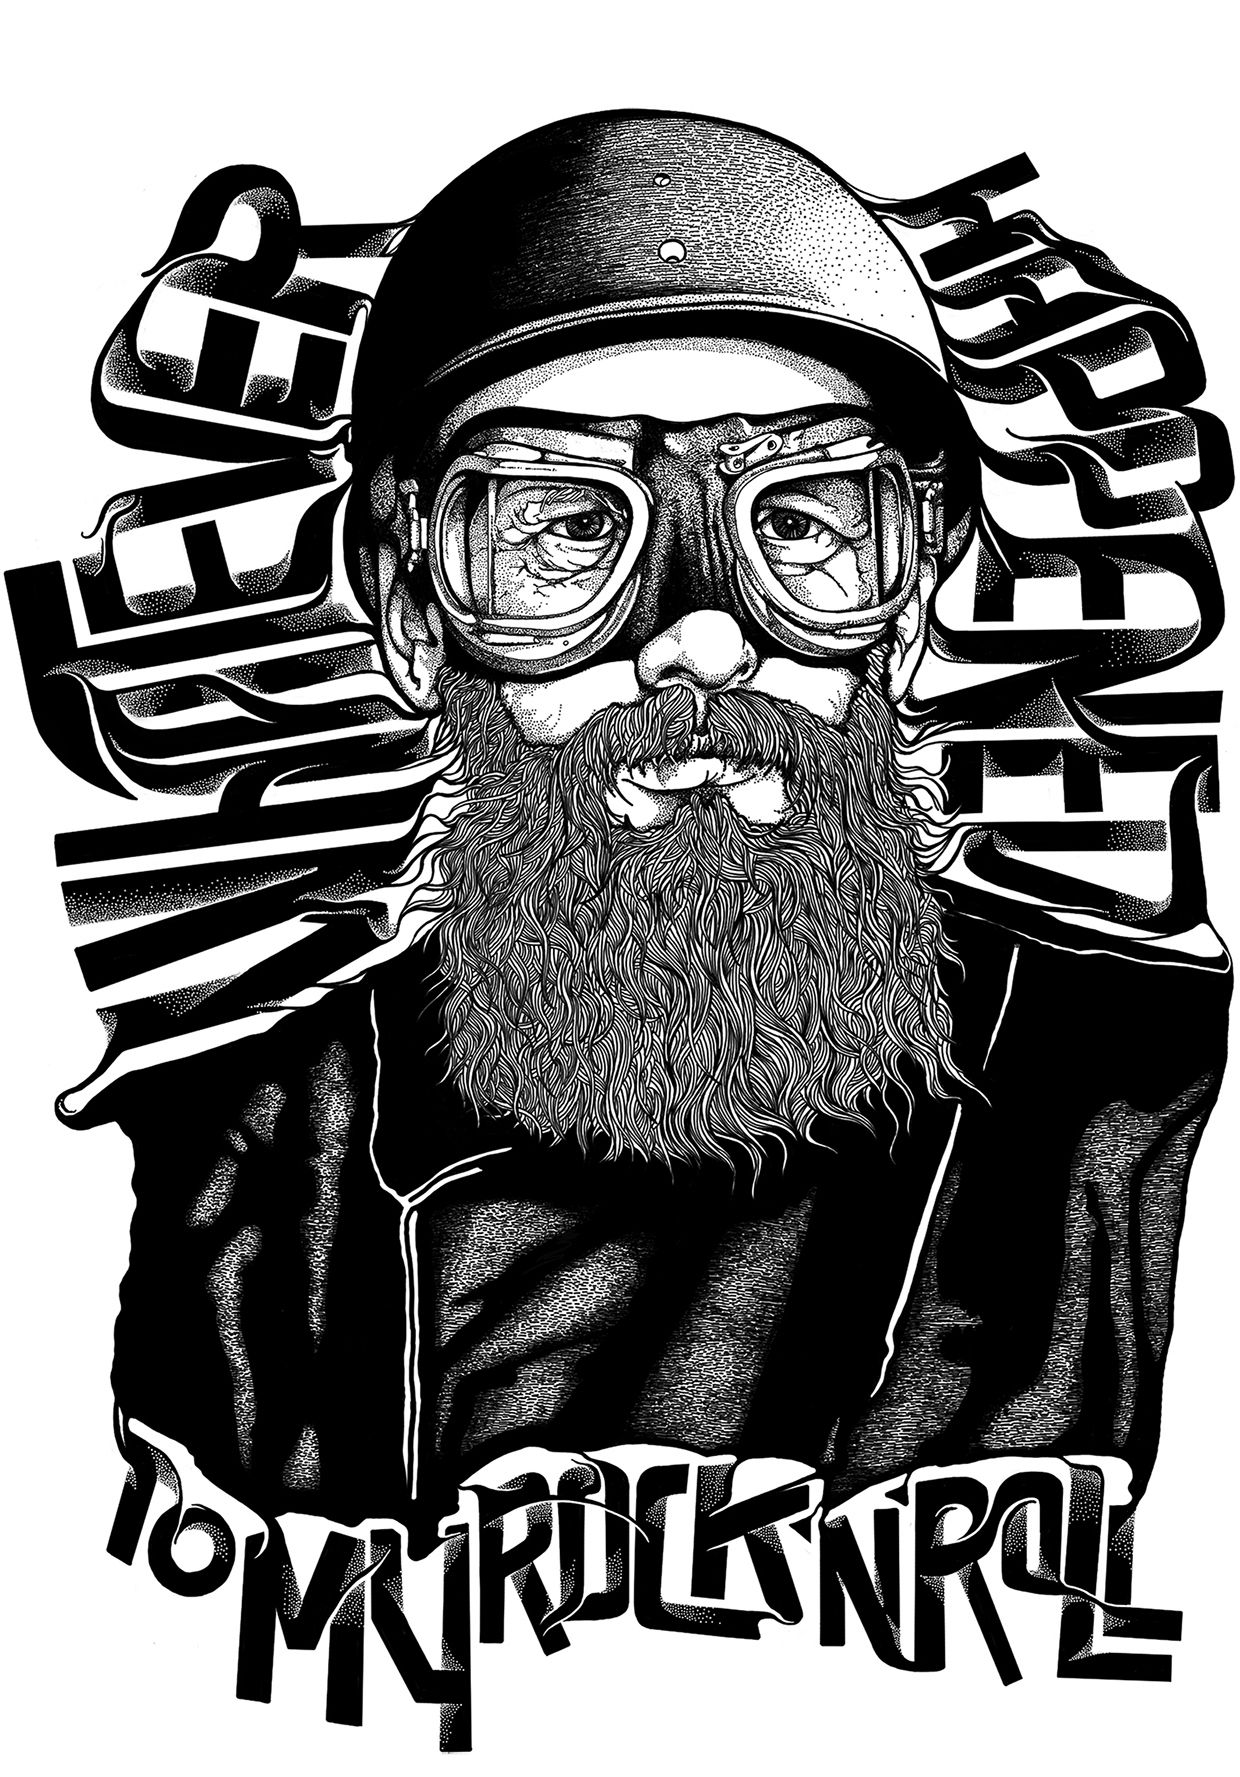 T shirt black rebel motorcycle club - Tribute To Black Rebel Motorcycle Club T Shirt